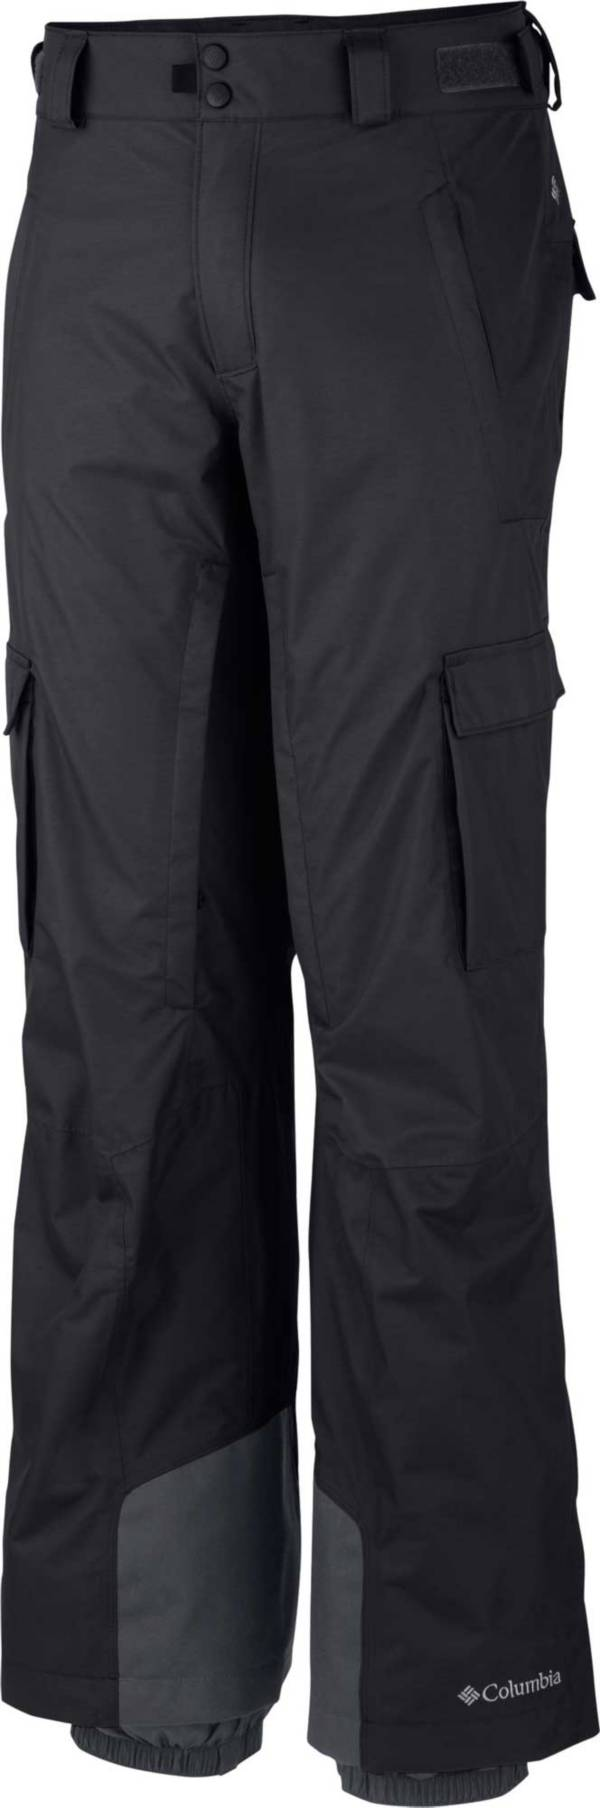 Columbia Men's Ridge 2 Run II Pants (Regular and Big & Tall) product image